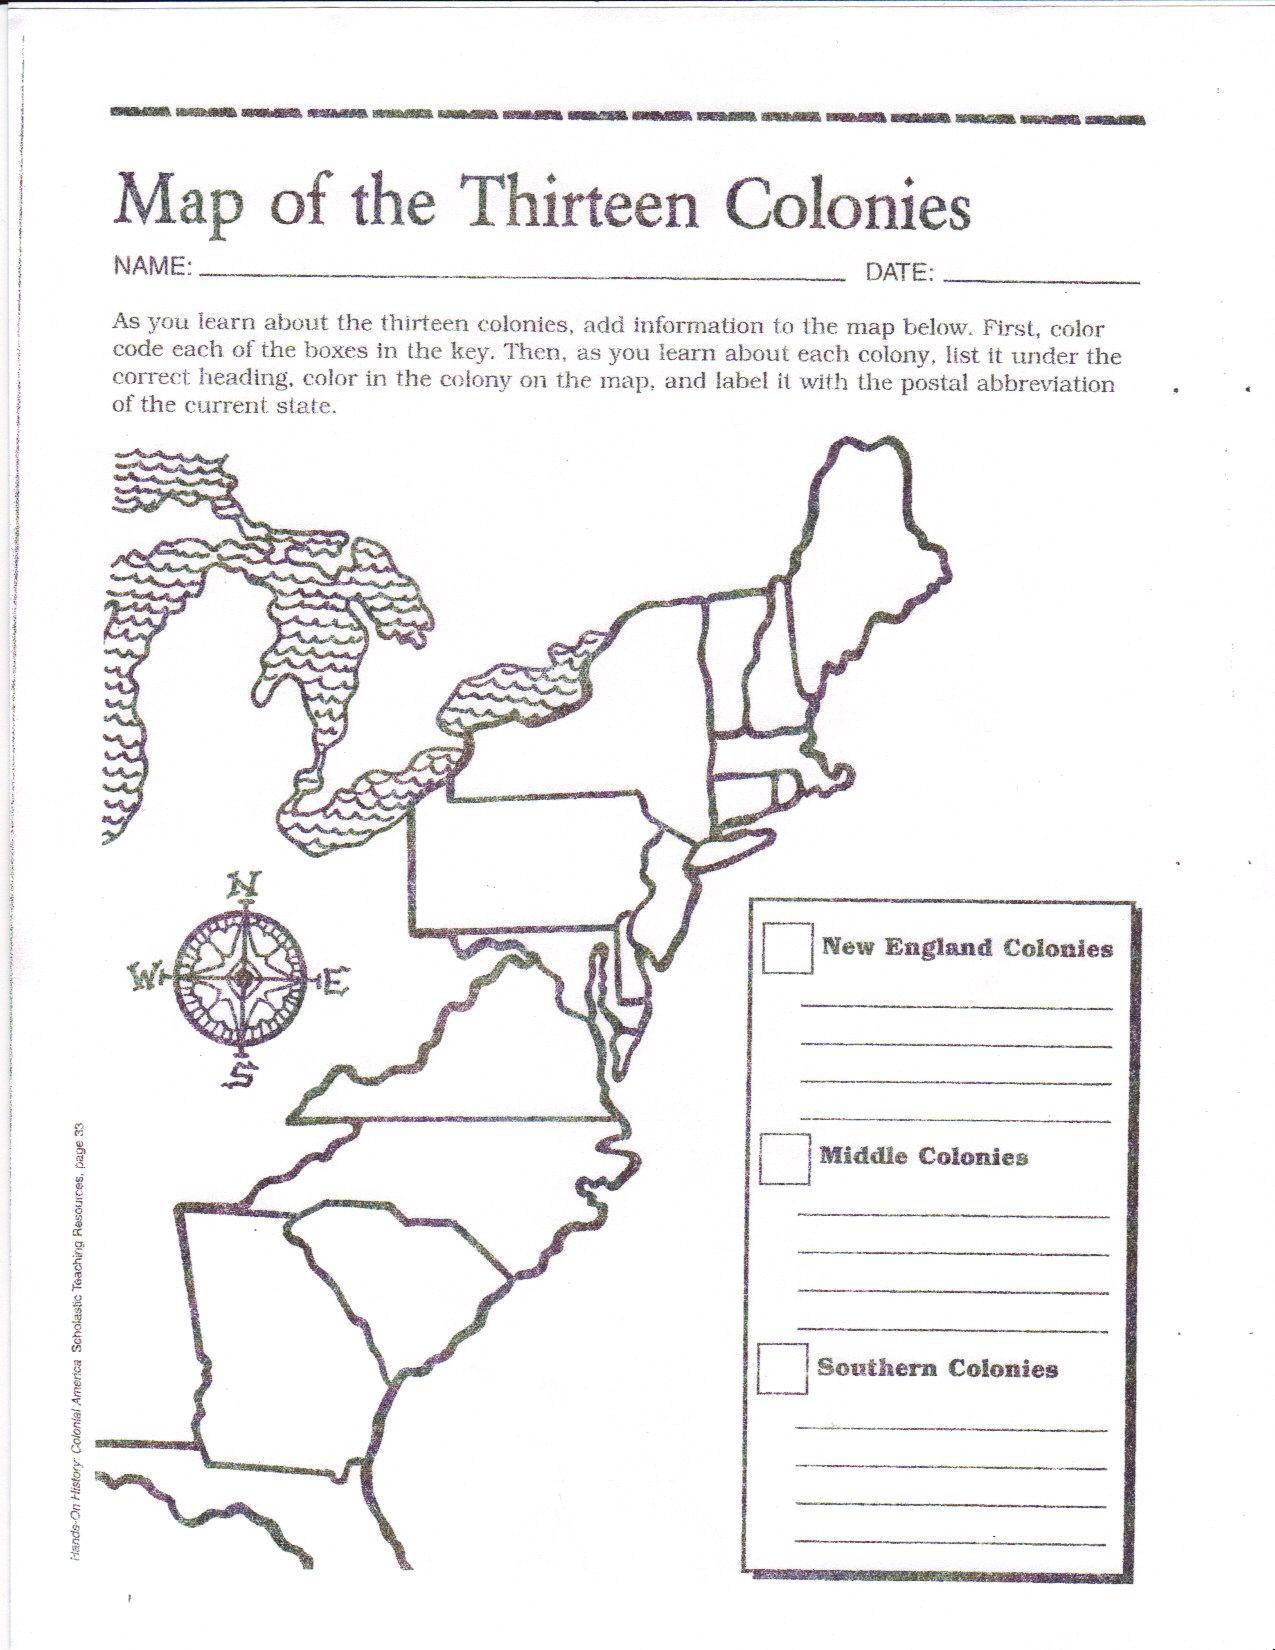 Free Printable 13 Colonies Map …   Activities   7Th G… - 13 Colonies Blank Map Printable